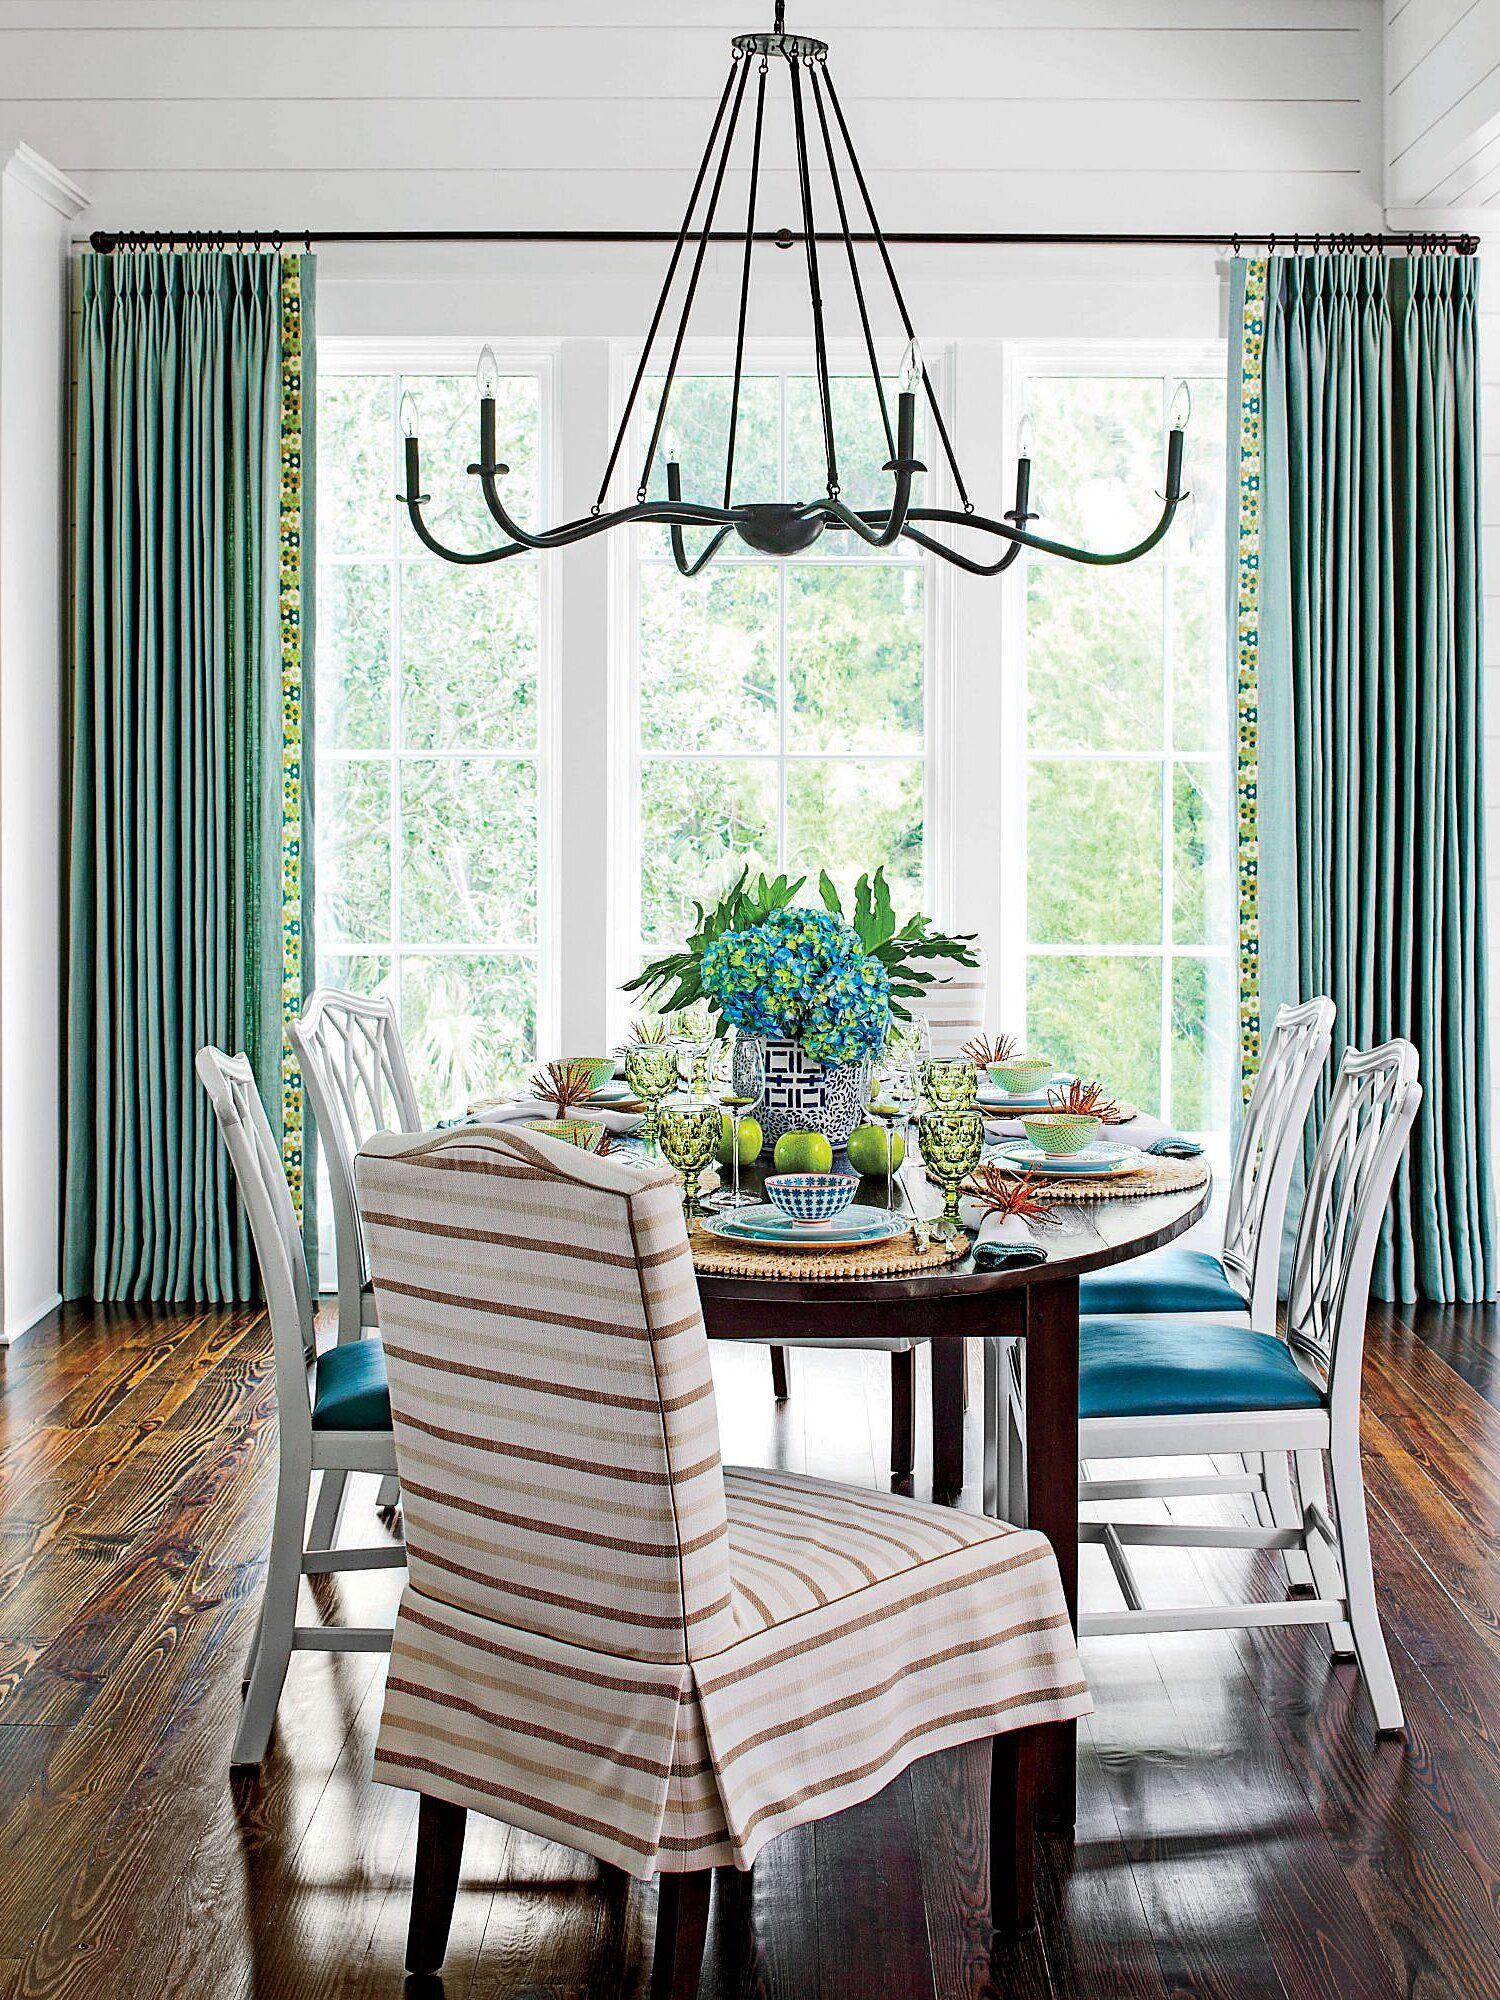 Inviting Dining Room Ideas Stylish Dining Room Dining Room Decor Traditional Interior Design Dining Room